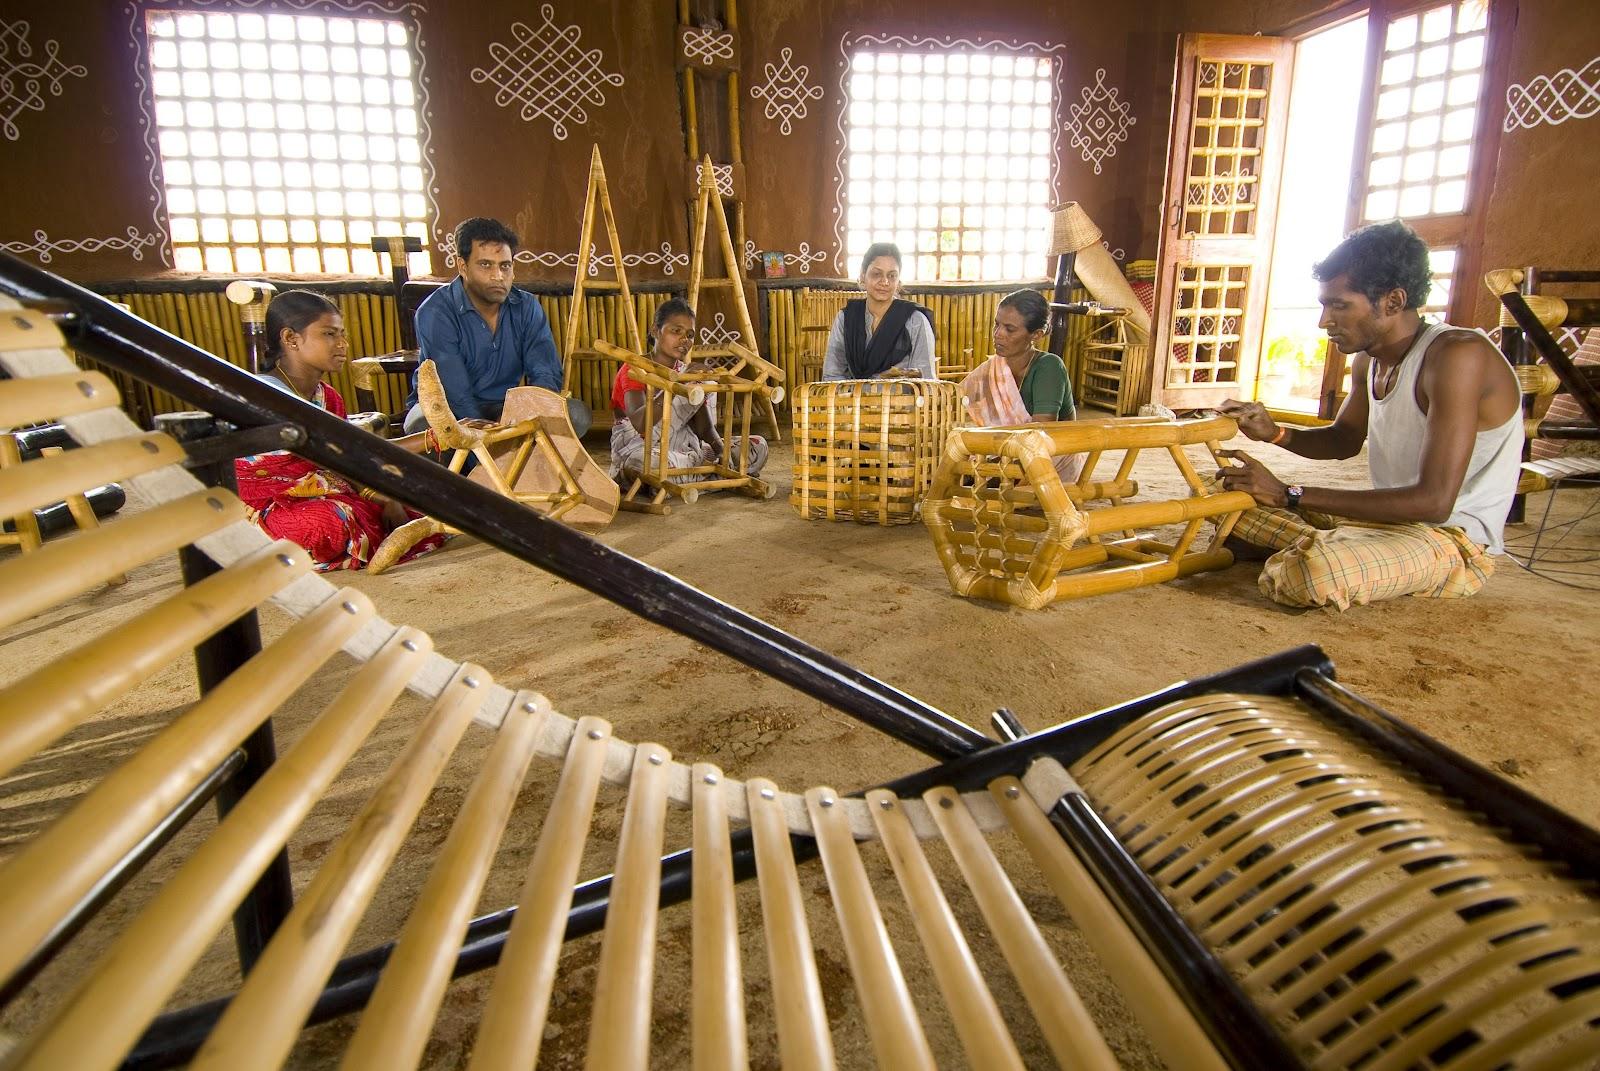 Malkha Bamboo House Exhibition